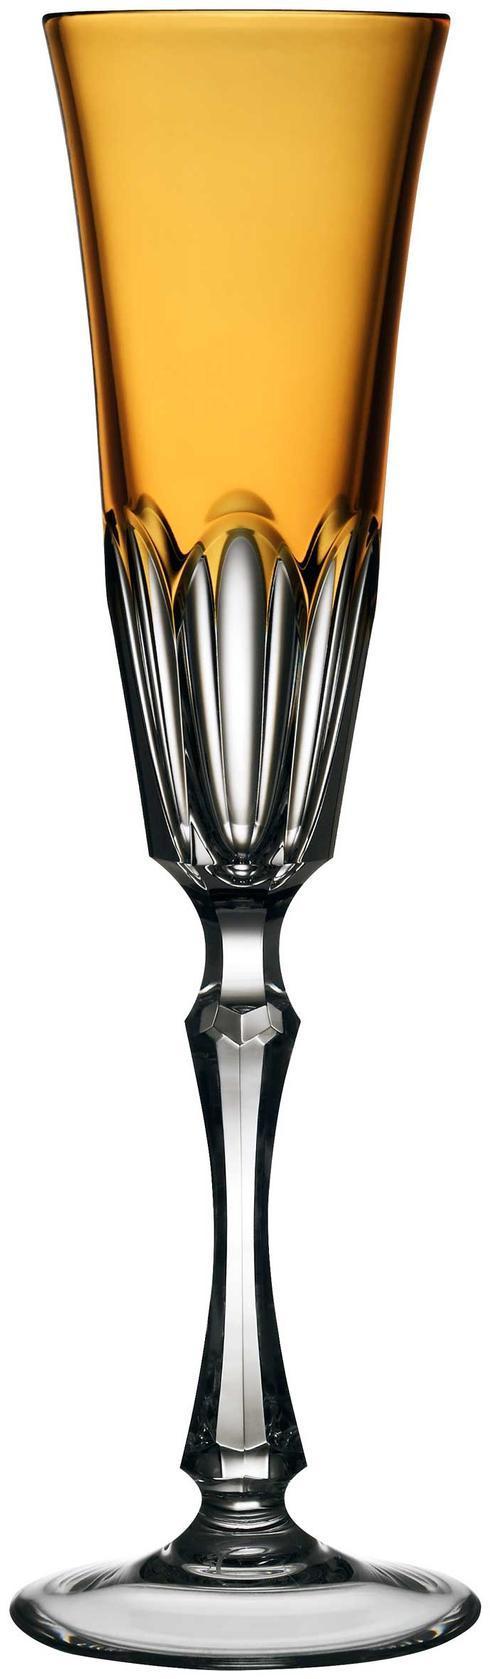 $198.00 Amber Champagne Flute